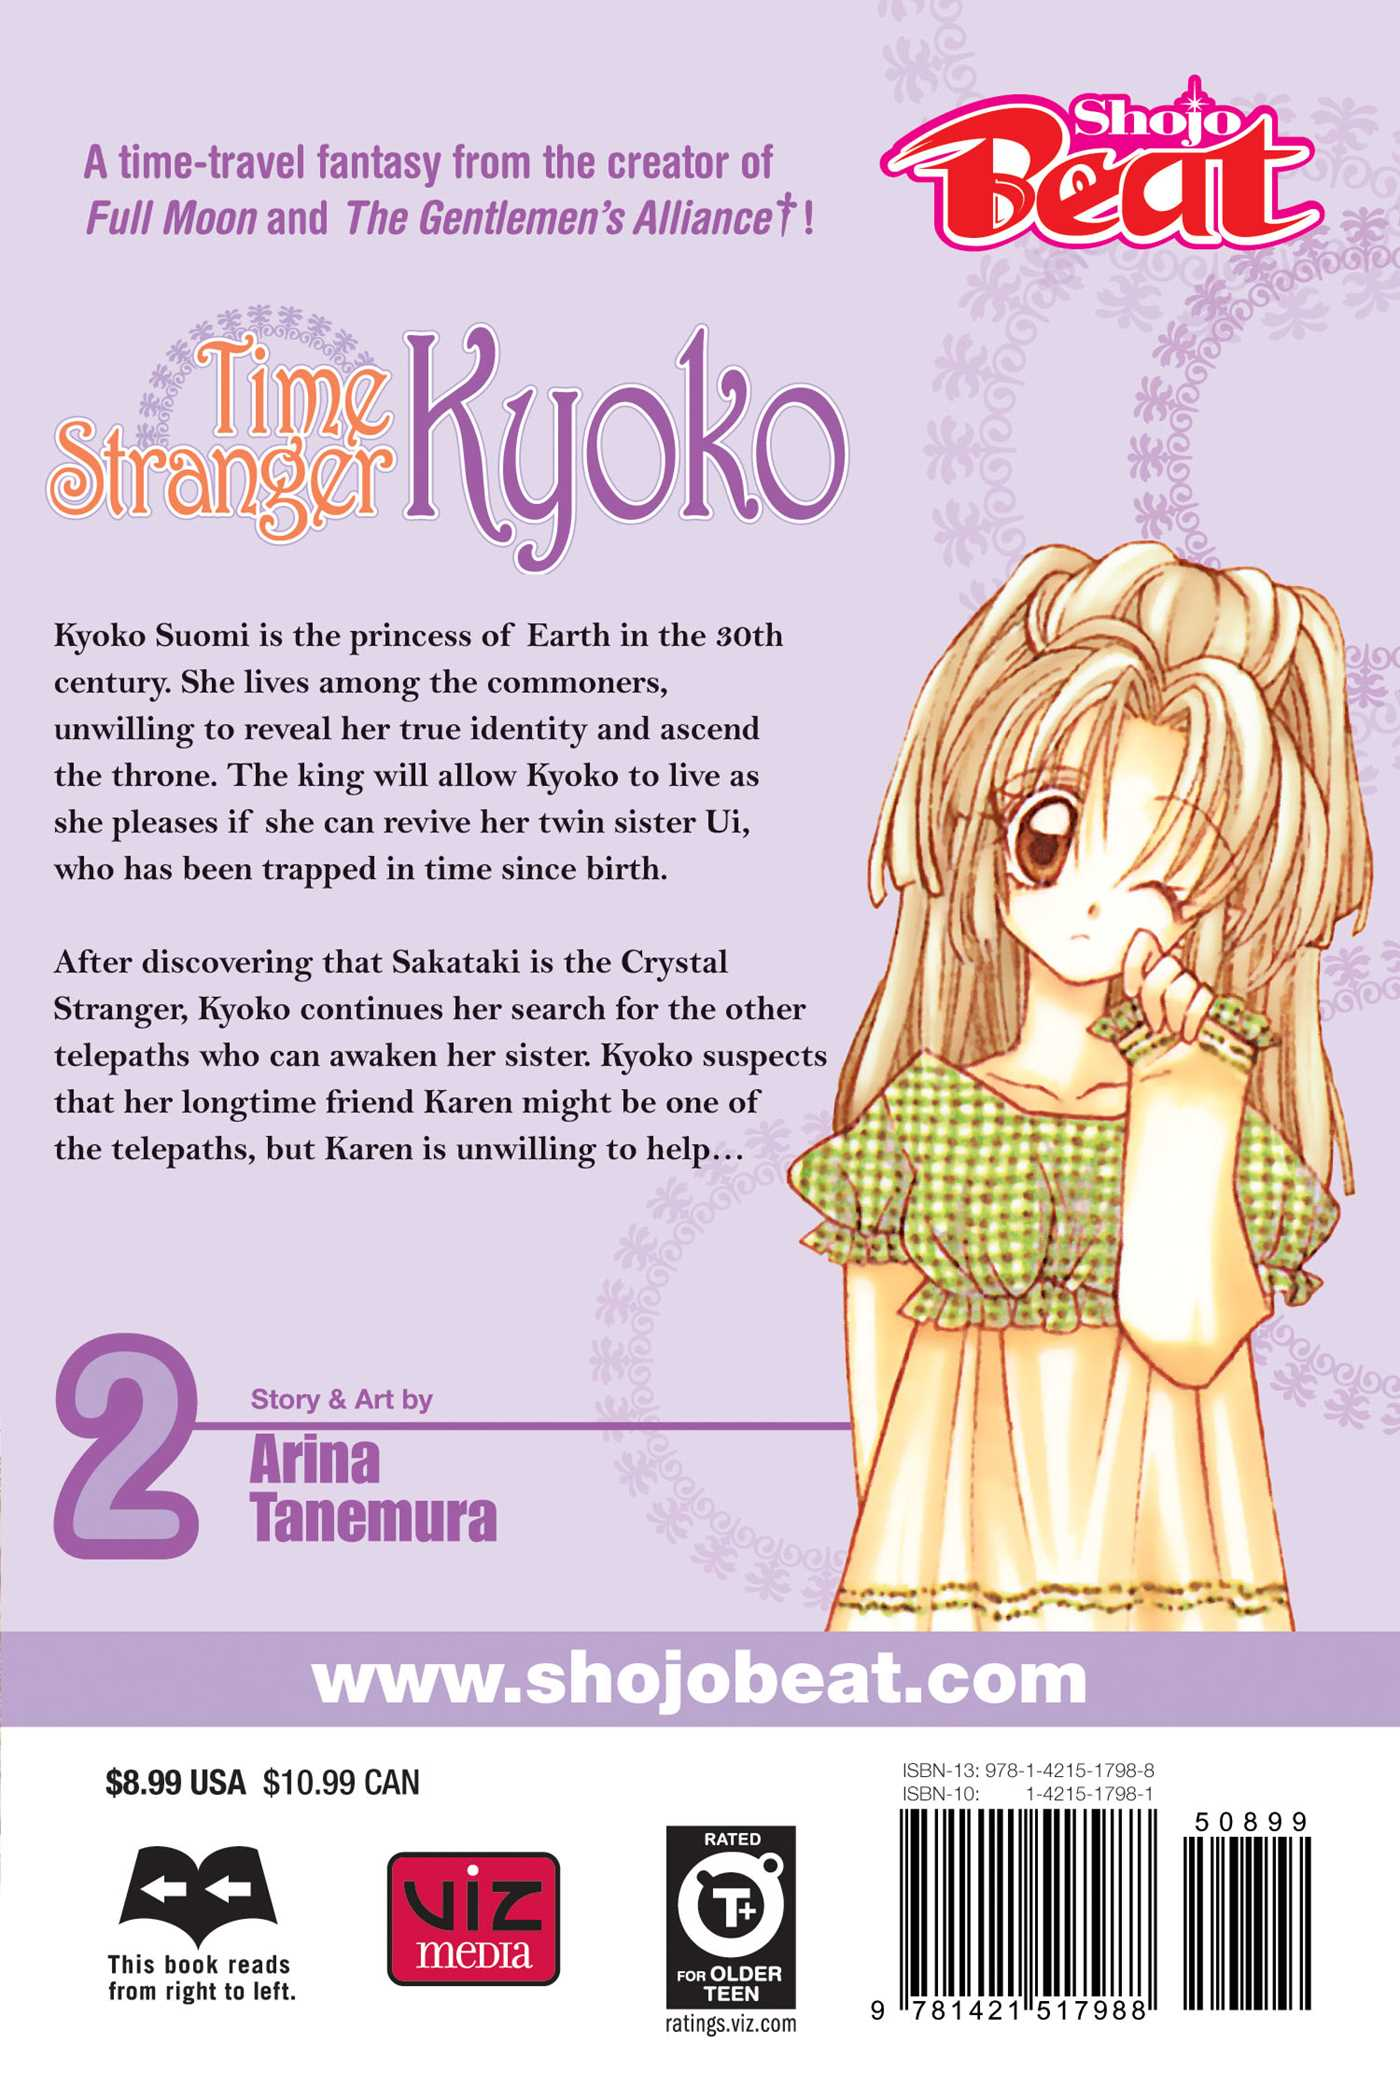 Time stranger kyoko vol 2 9781421517988 hr back